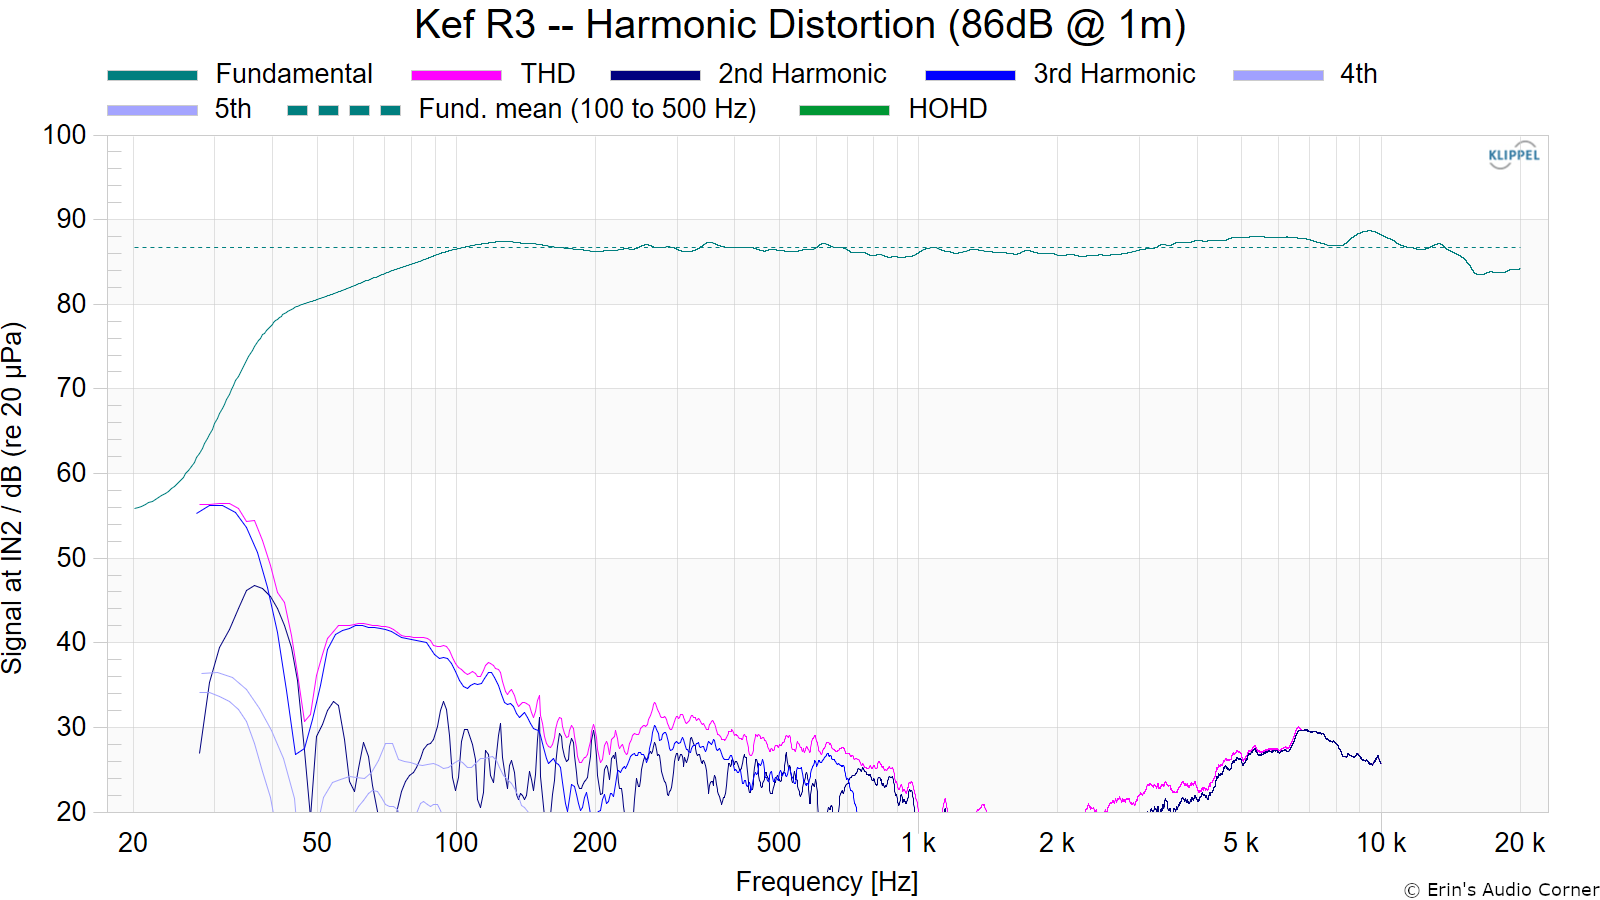 Kef R3 -- Harmonic Distortion (86dB @ 1m)_fundamental.png